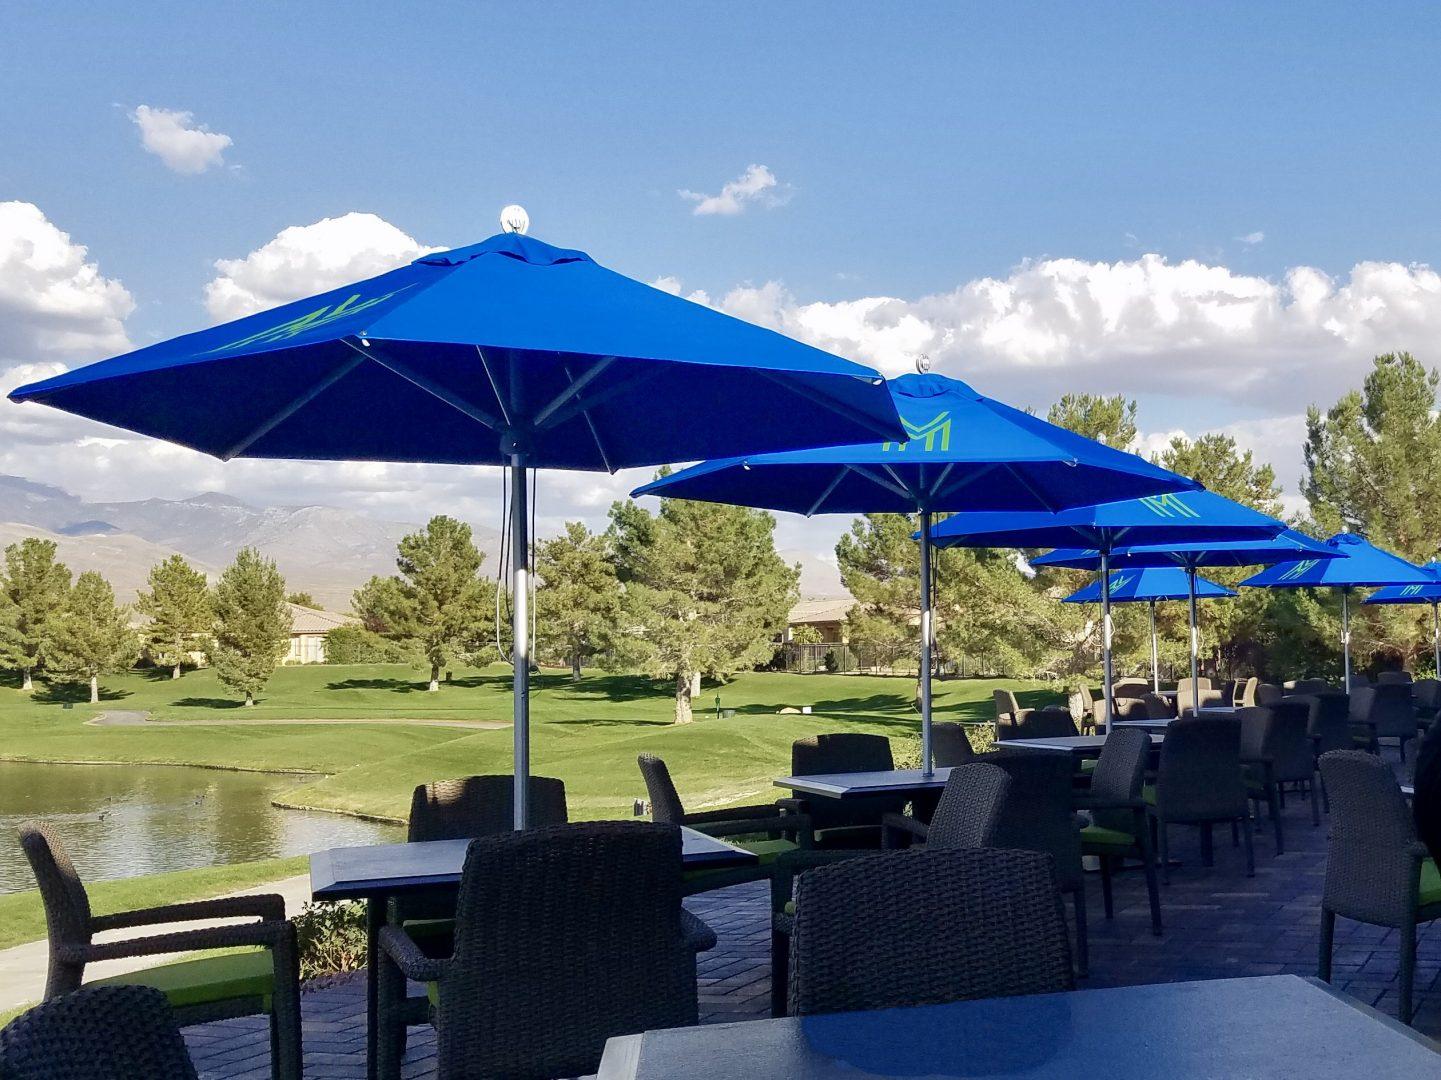 parasols on golf club, near a lake